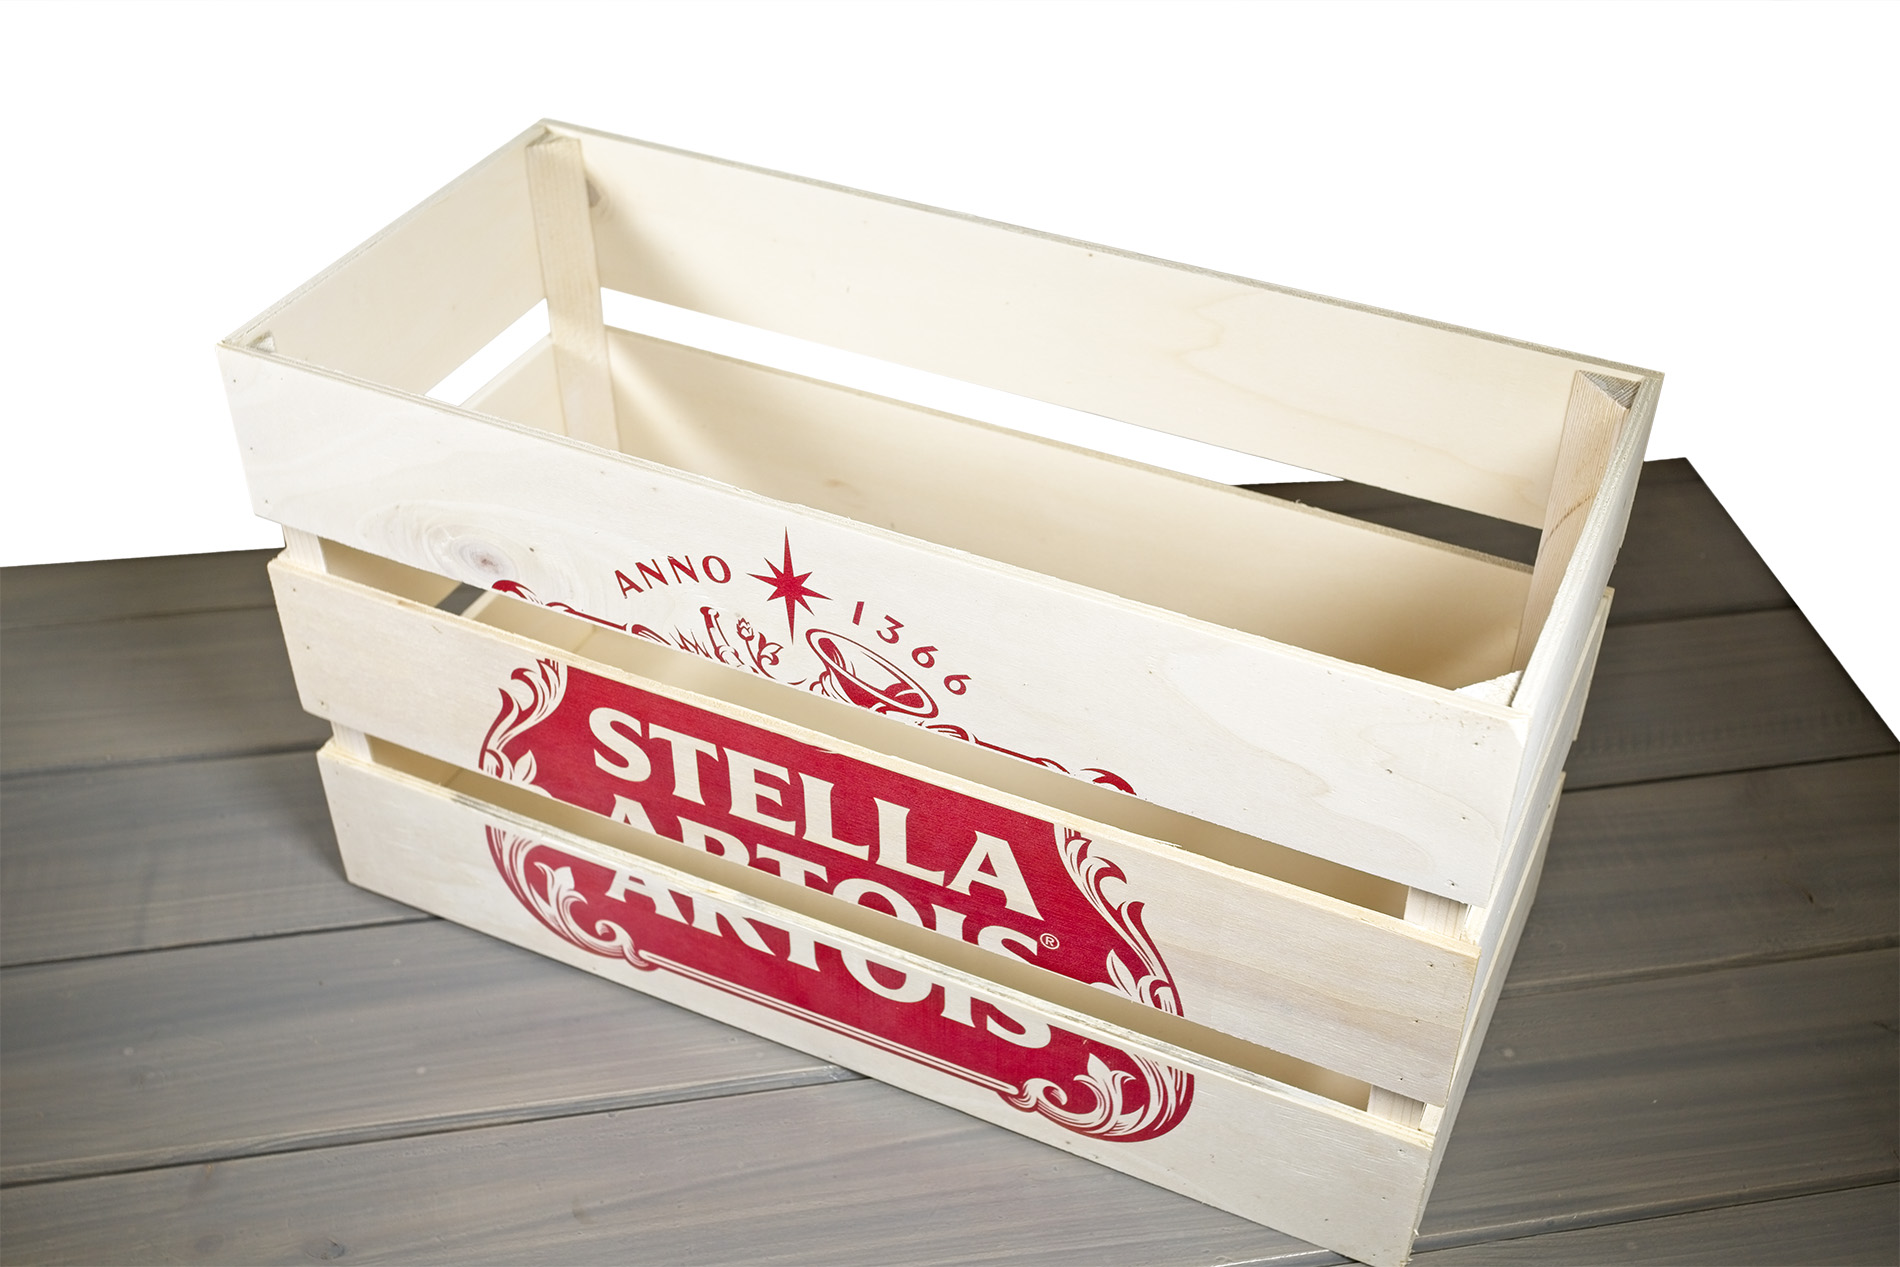 Pitrusino Cassetta Design Wooden Crate